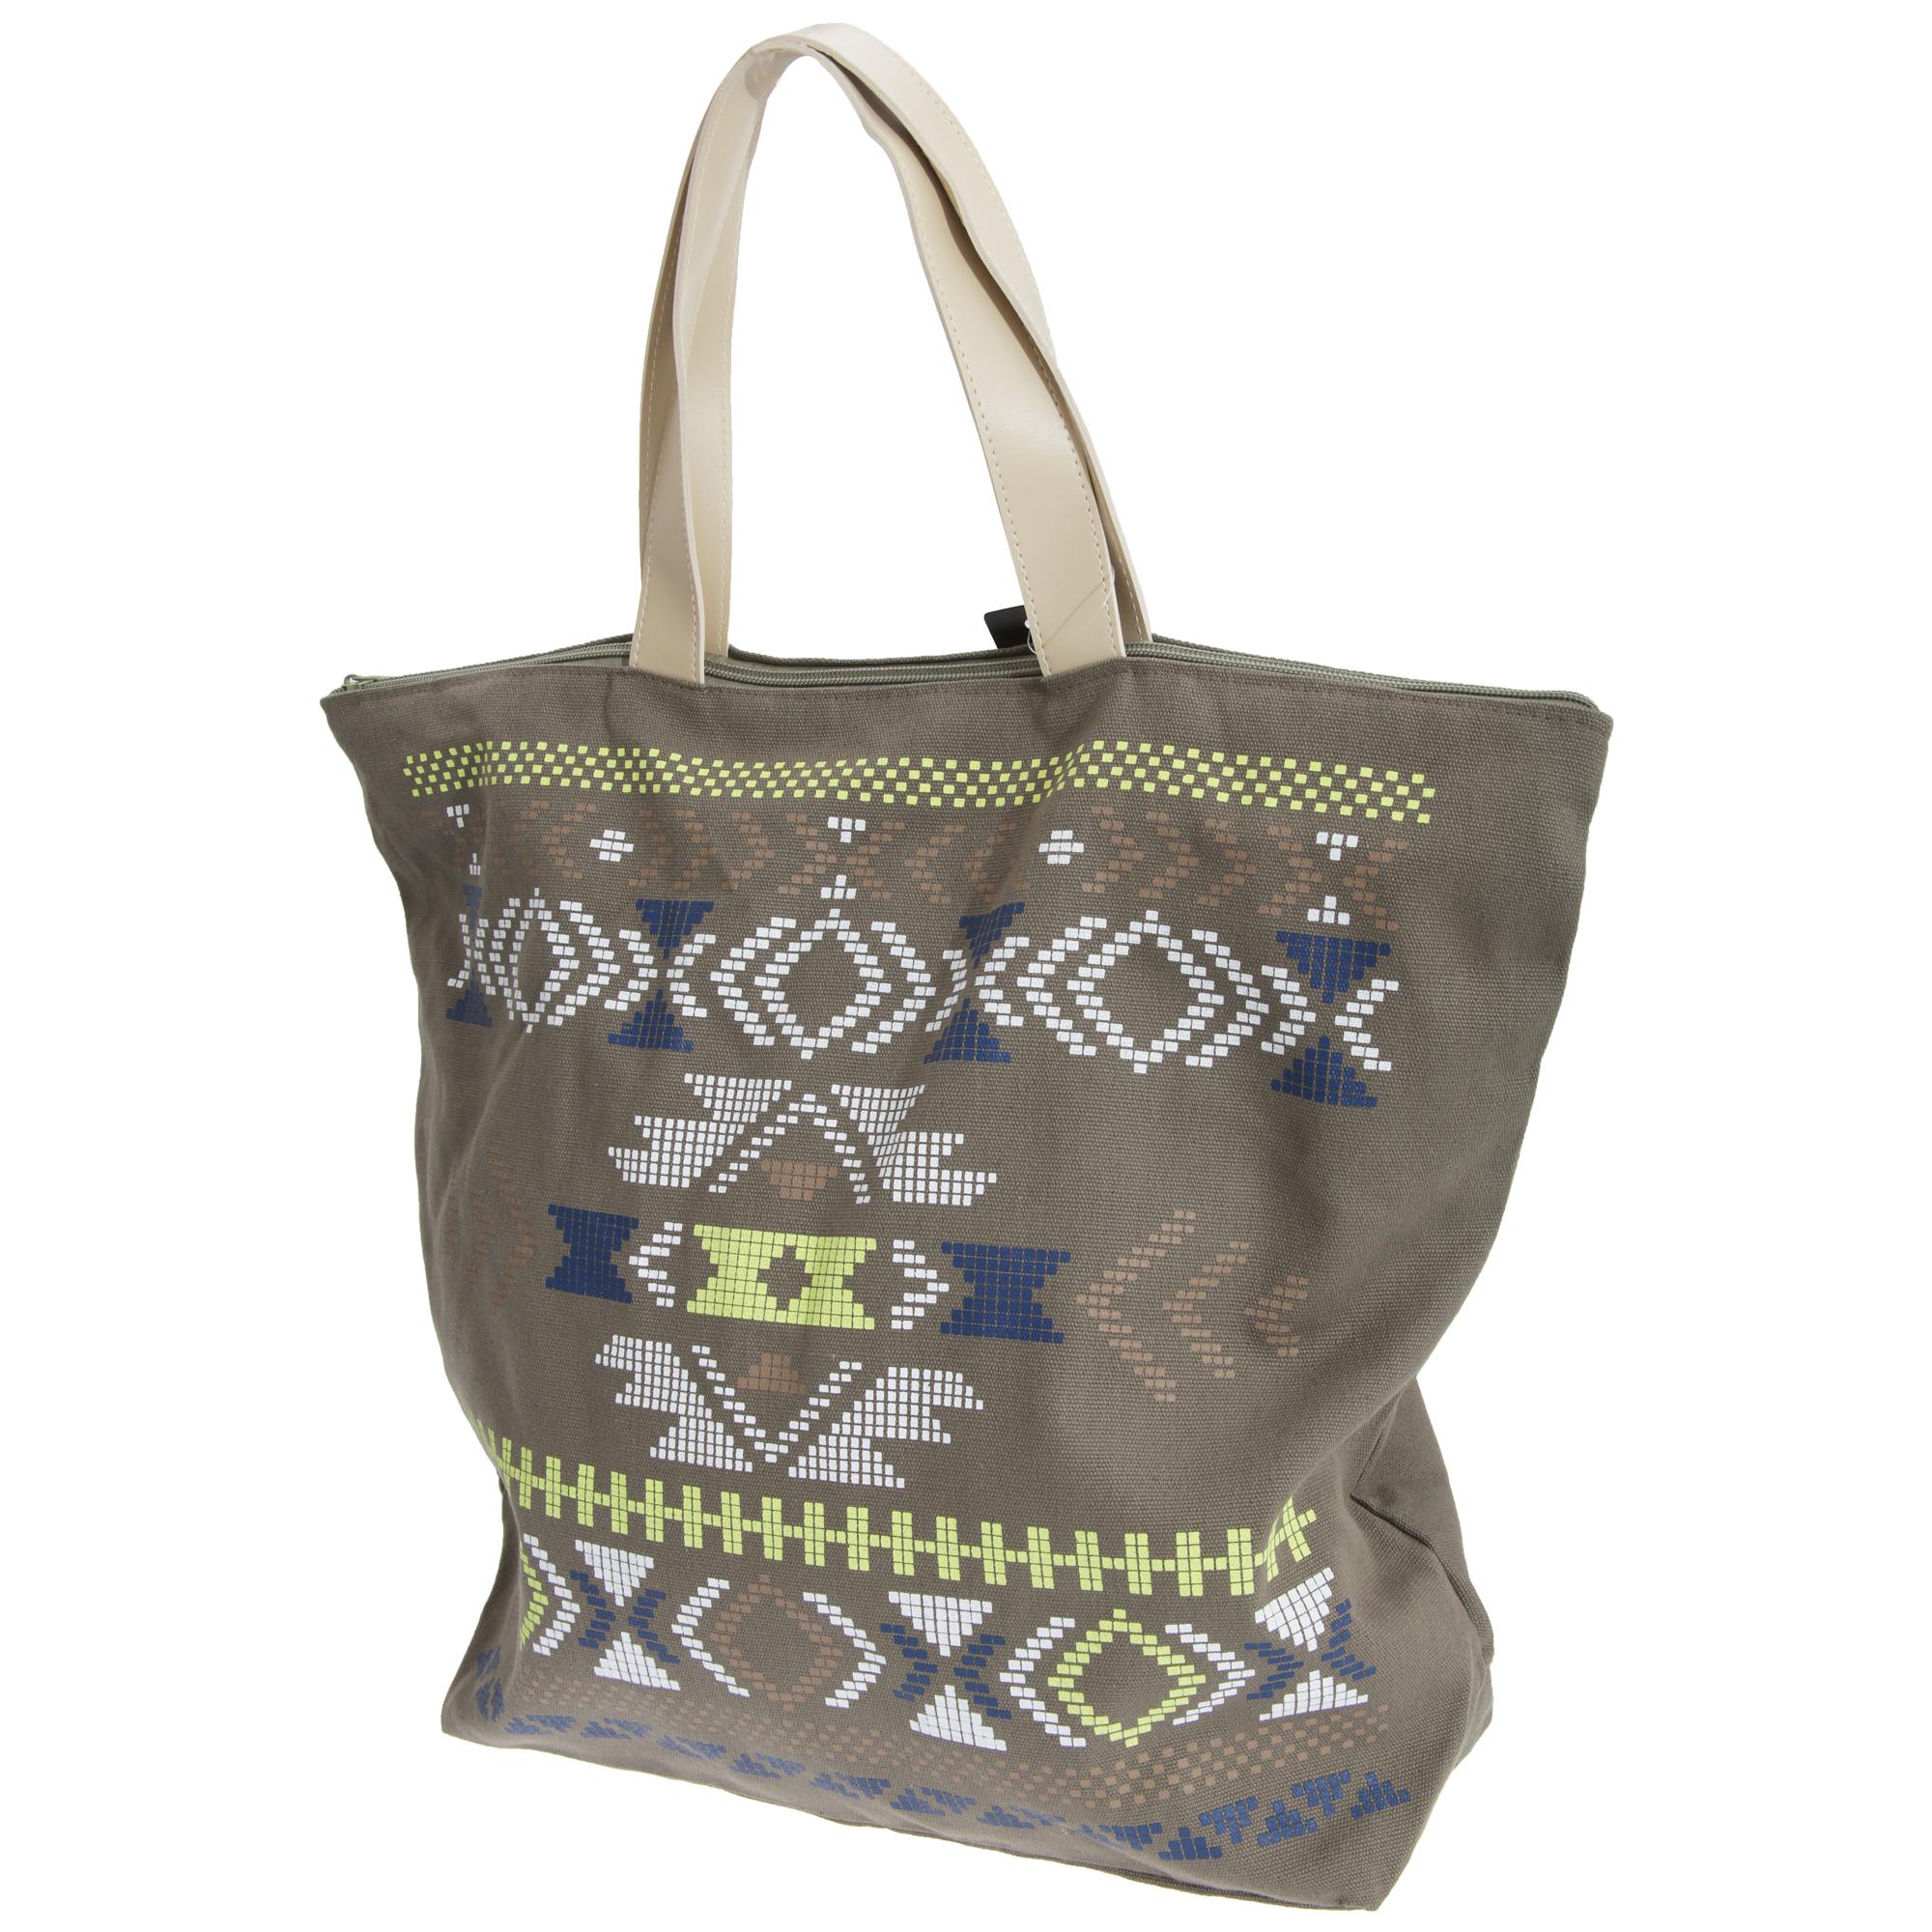 FLOSO Womens/Ladies Cotton Rich Aztec Print Top Handle Handbag (One Size) (Brown)